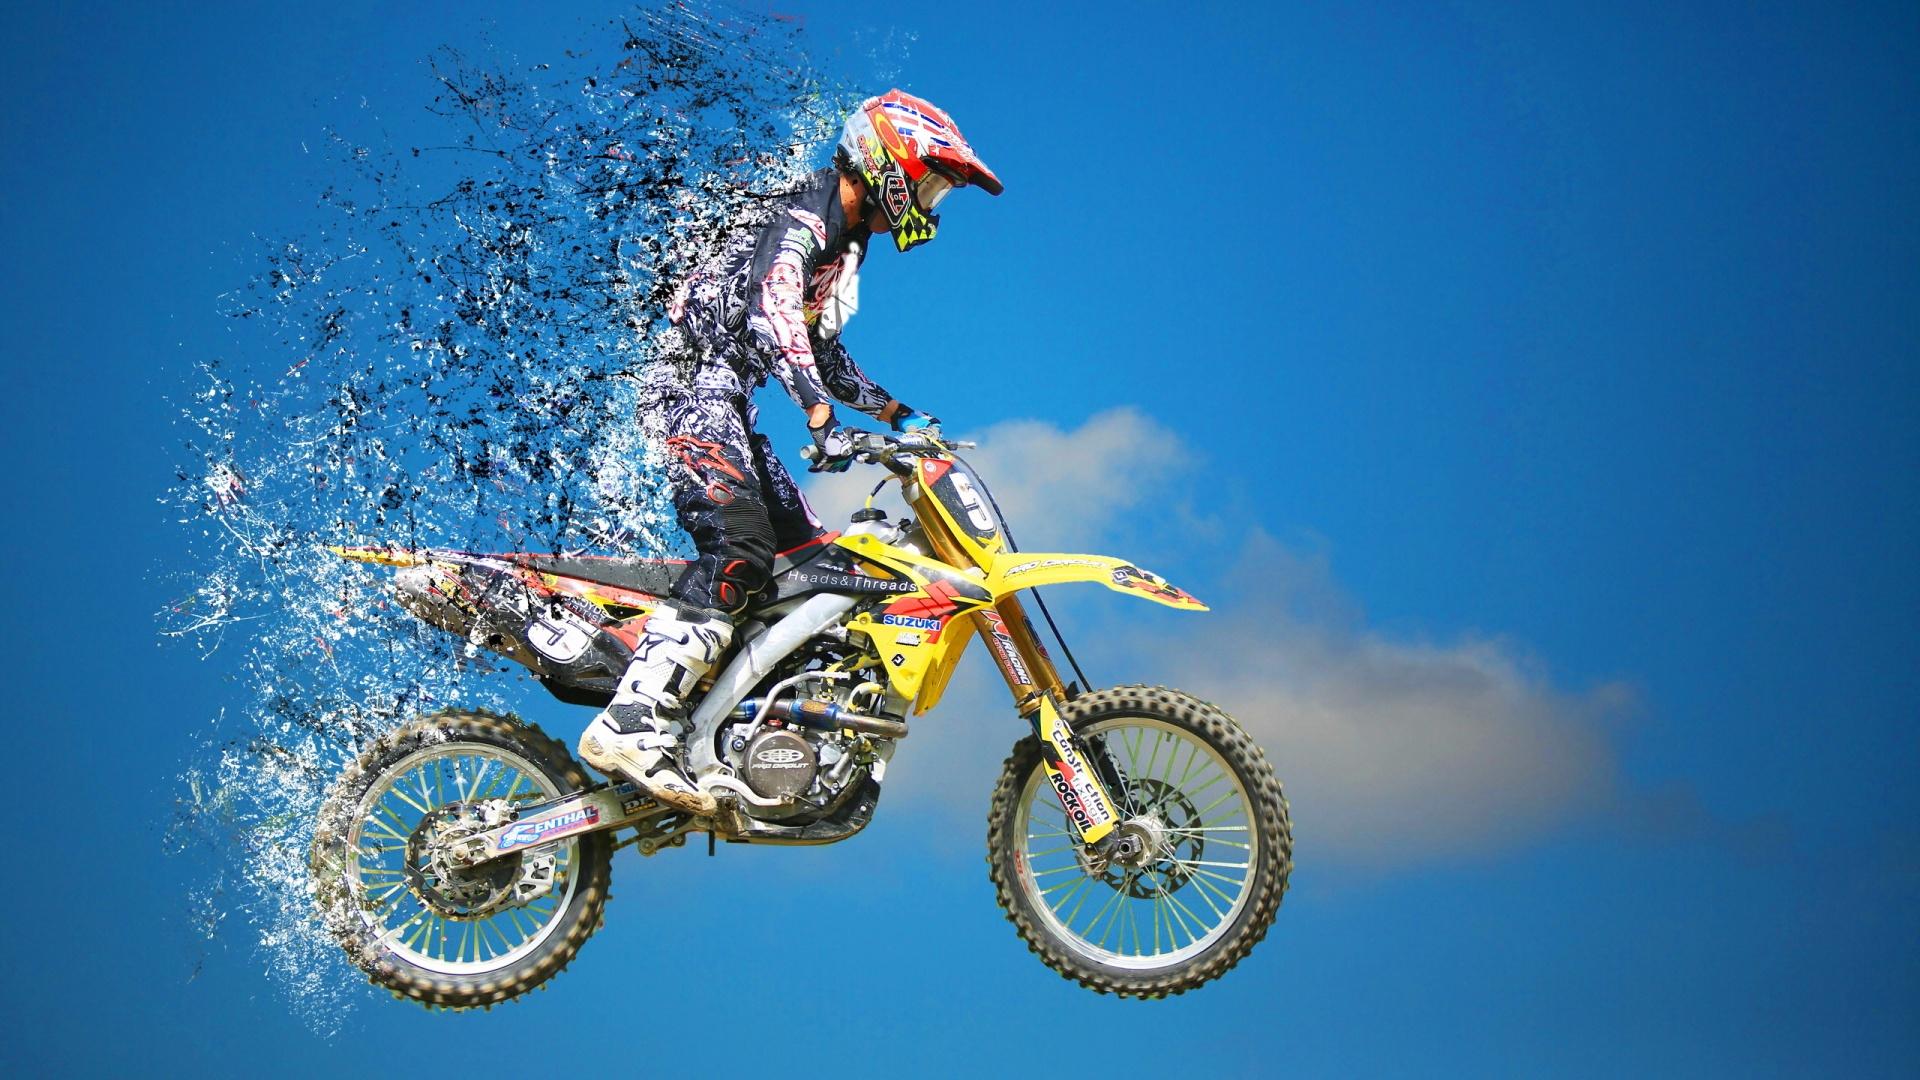 Fond D'écran De Motocross